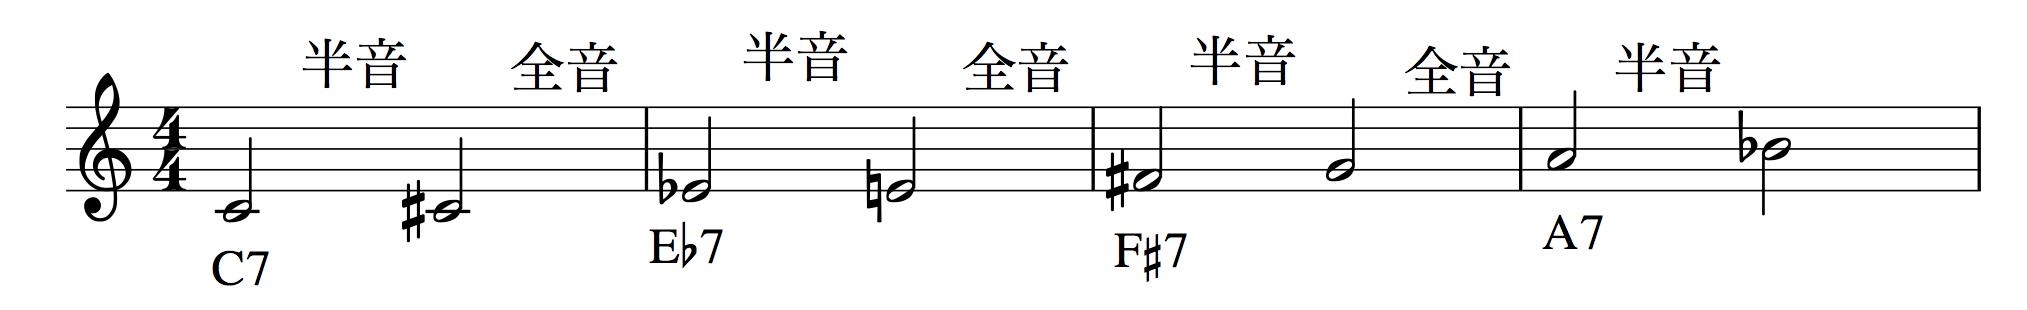 conbination-diminish-1